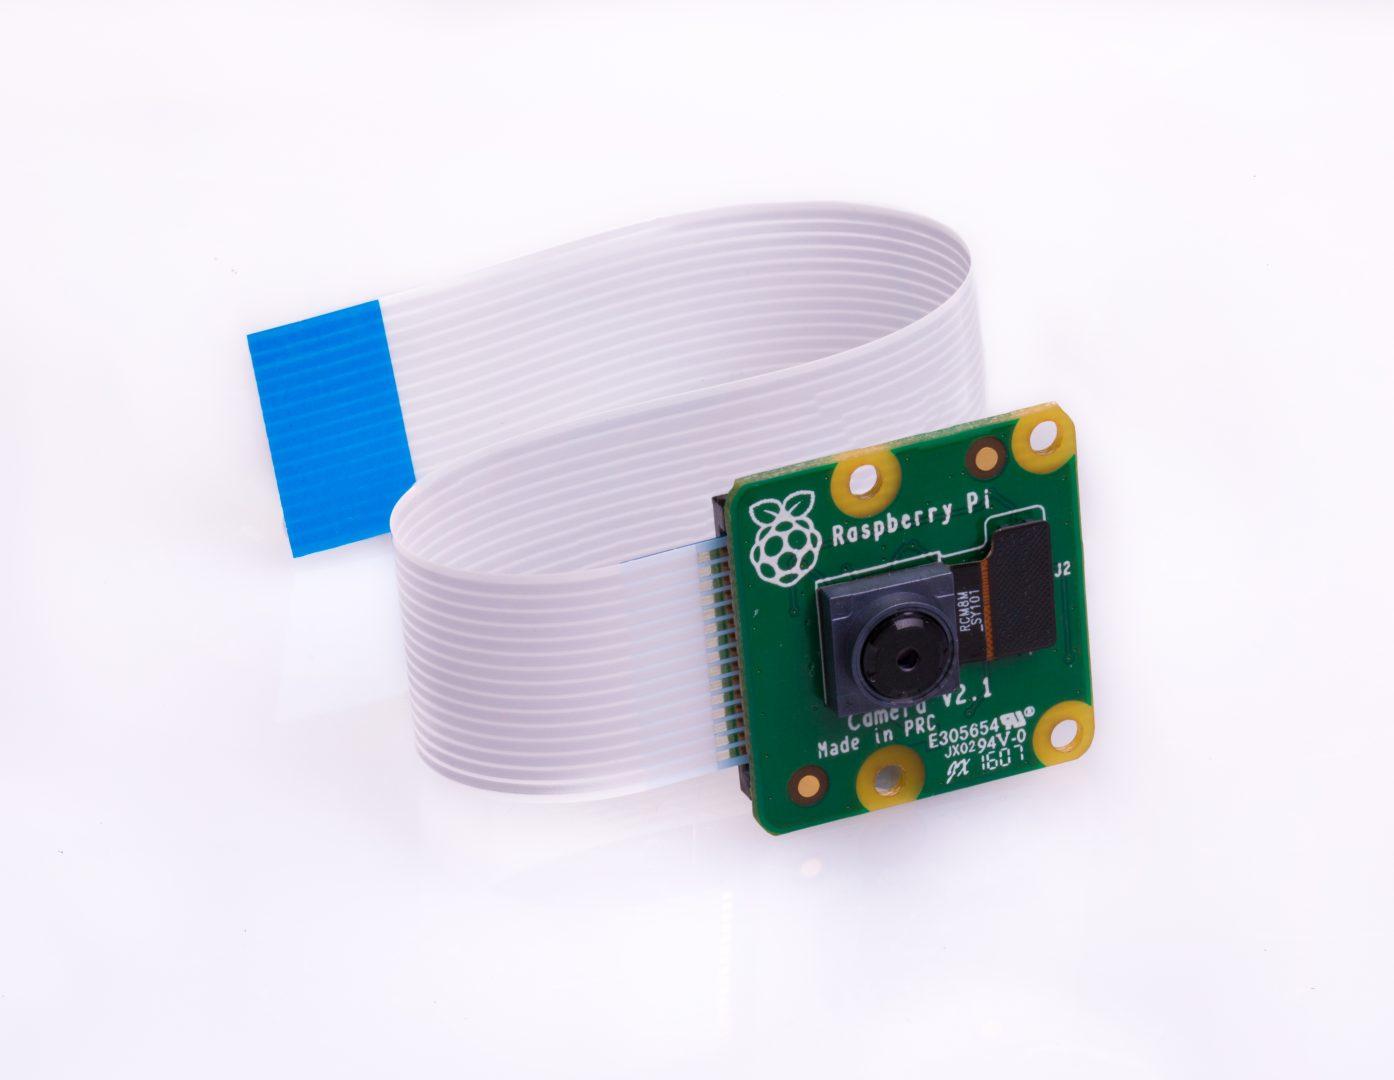 Raspberry Pi 3 Camera Bundle - Review   element14   RoadTests & Reviews